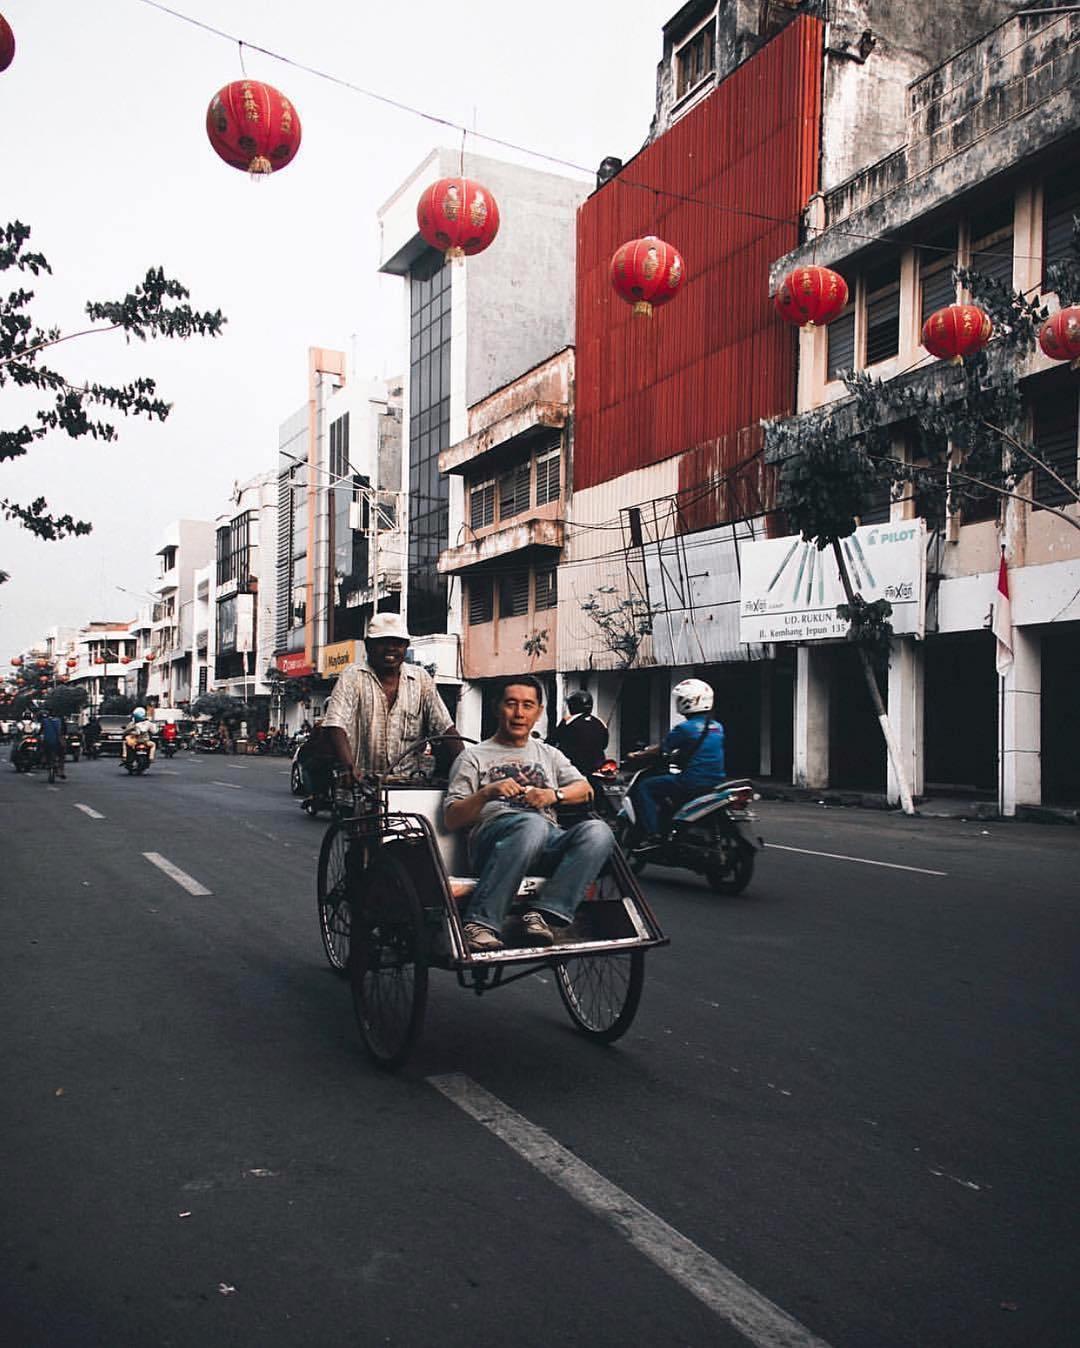 Kembang Jepun Surabaya Kota Dolan Dolen Dolaners Jalan